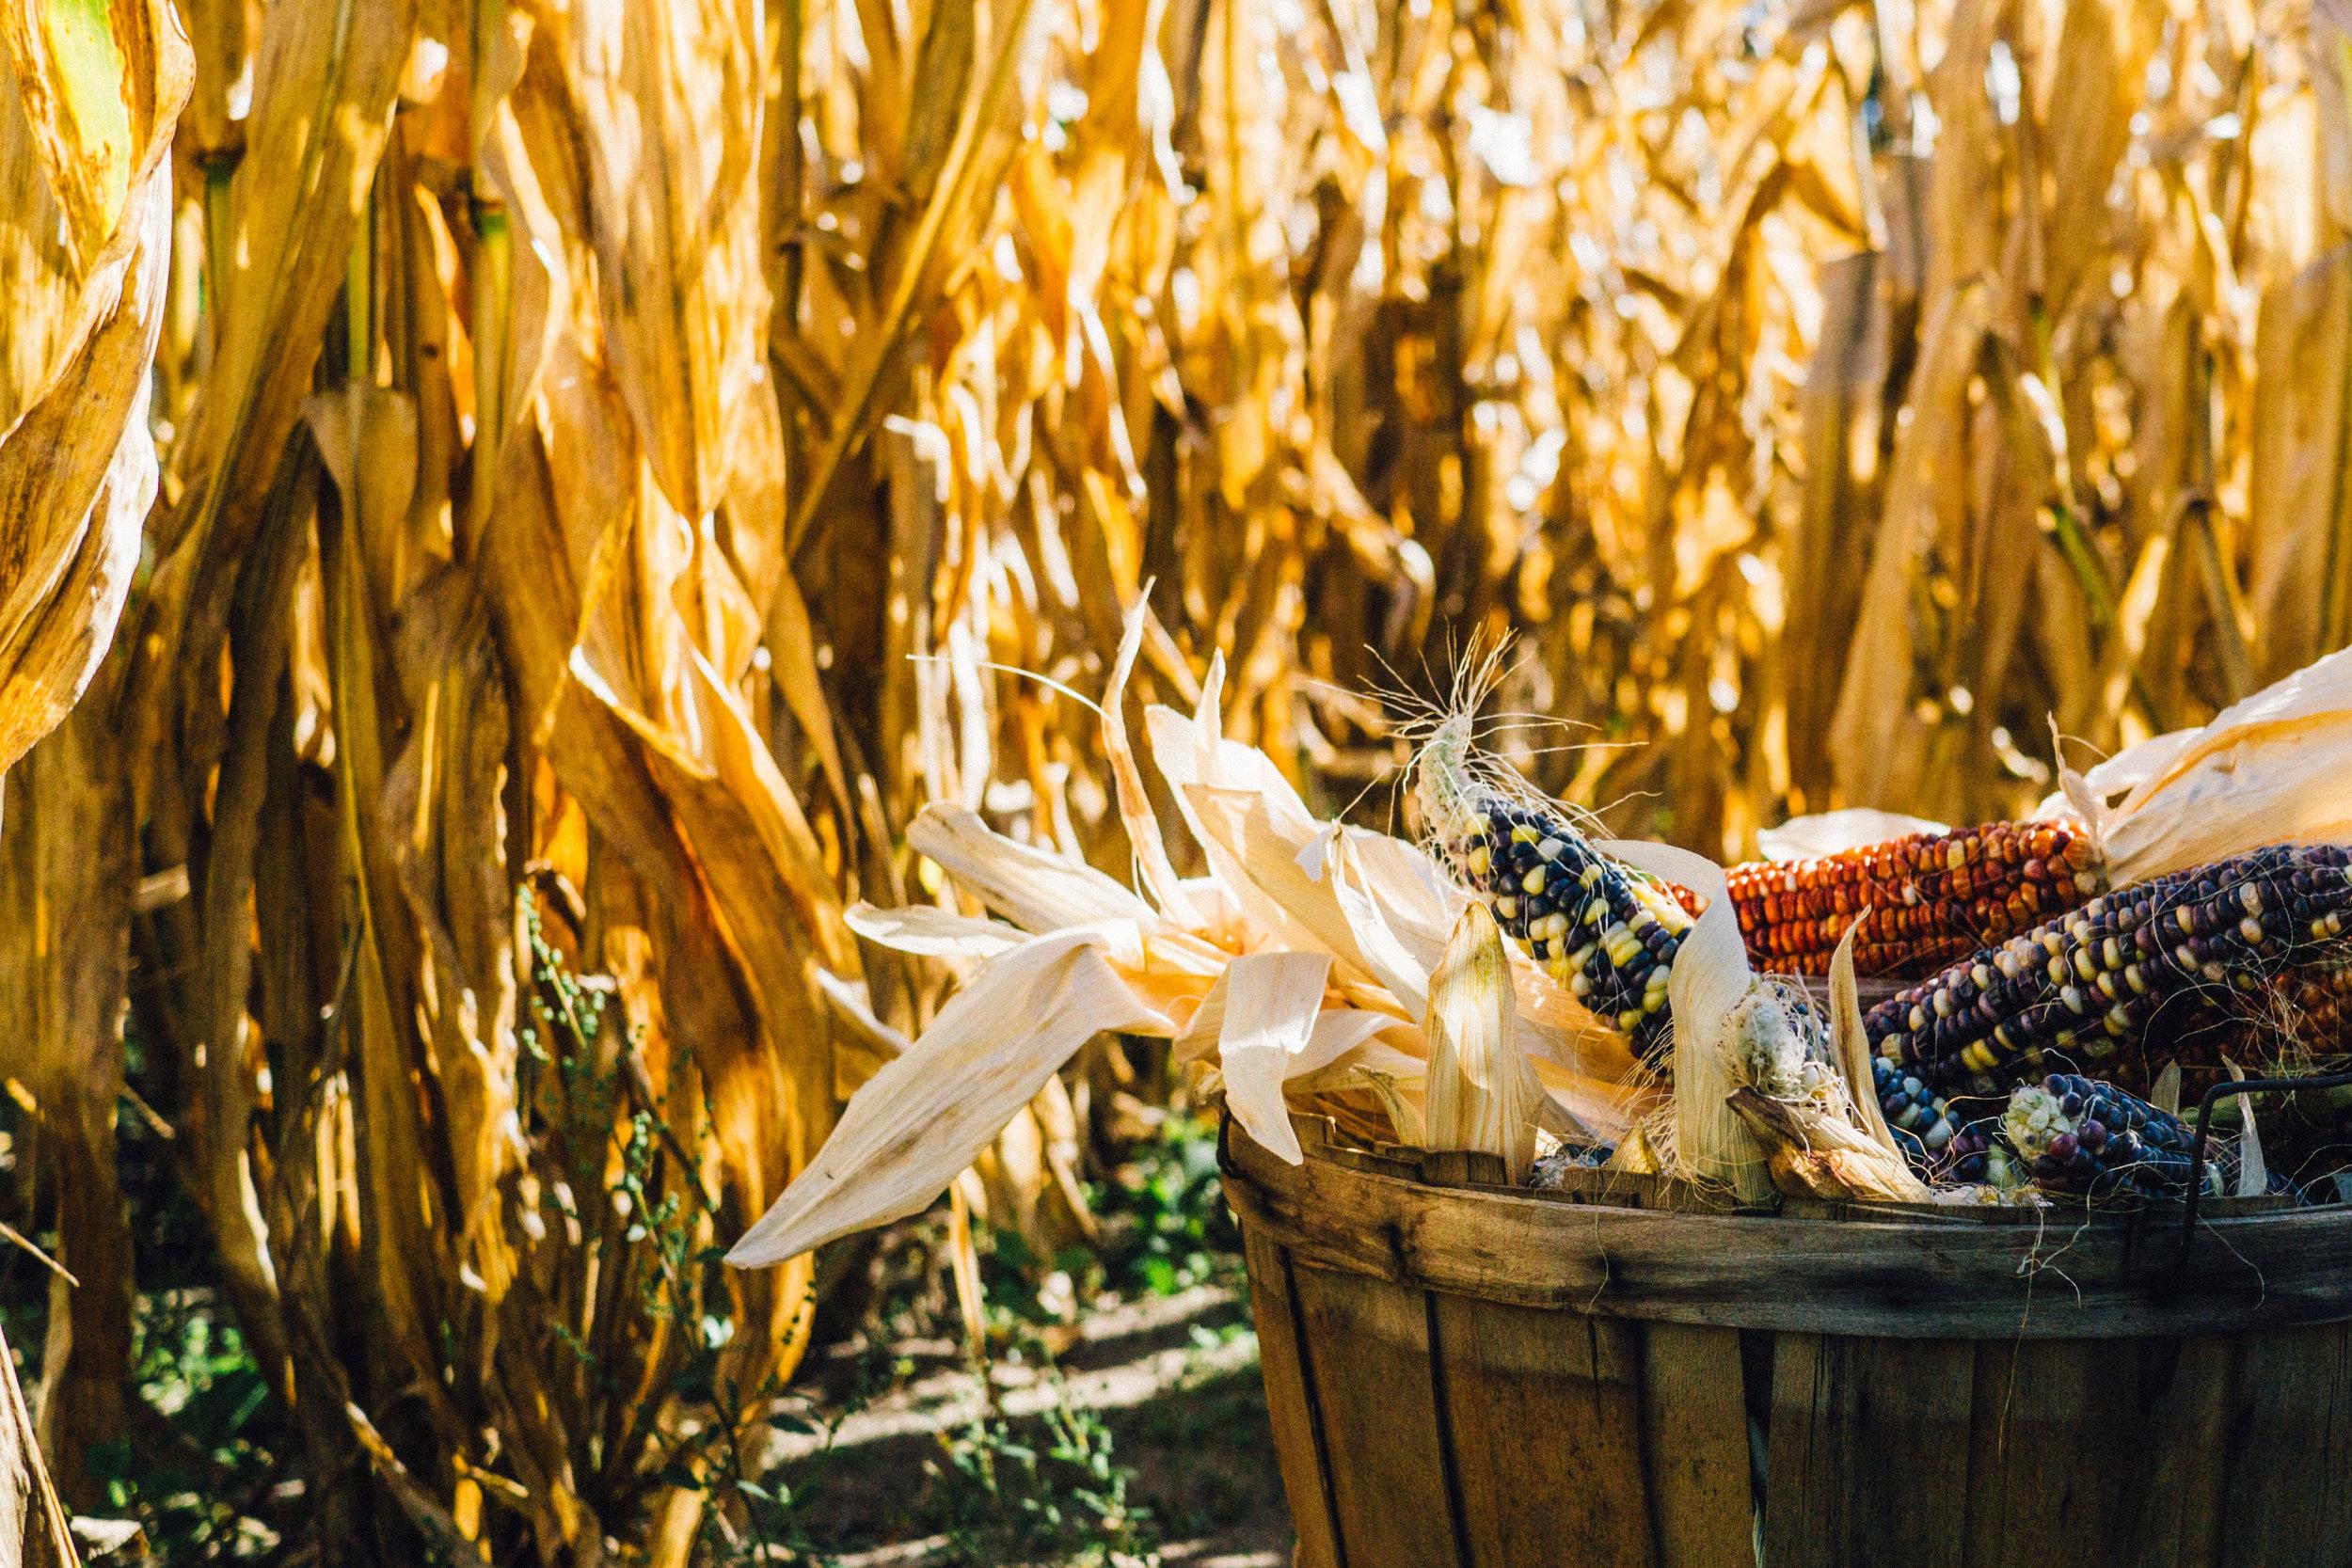 industries---maize-by-aaron-burden-40486-unsplash.jpg